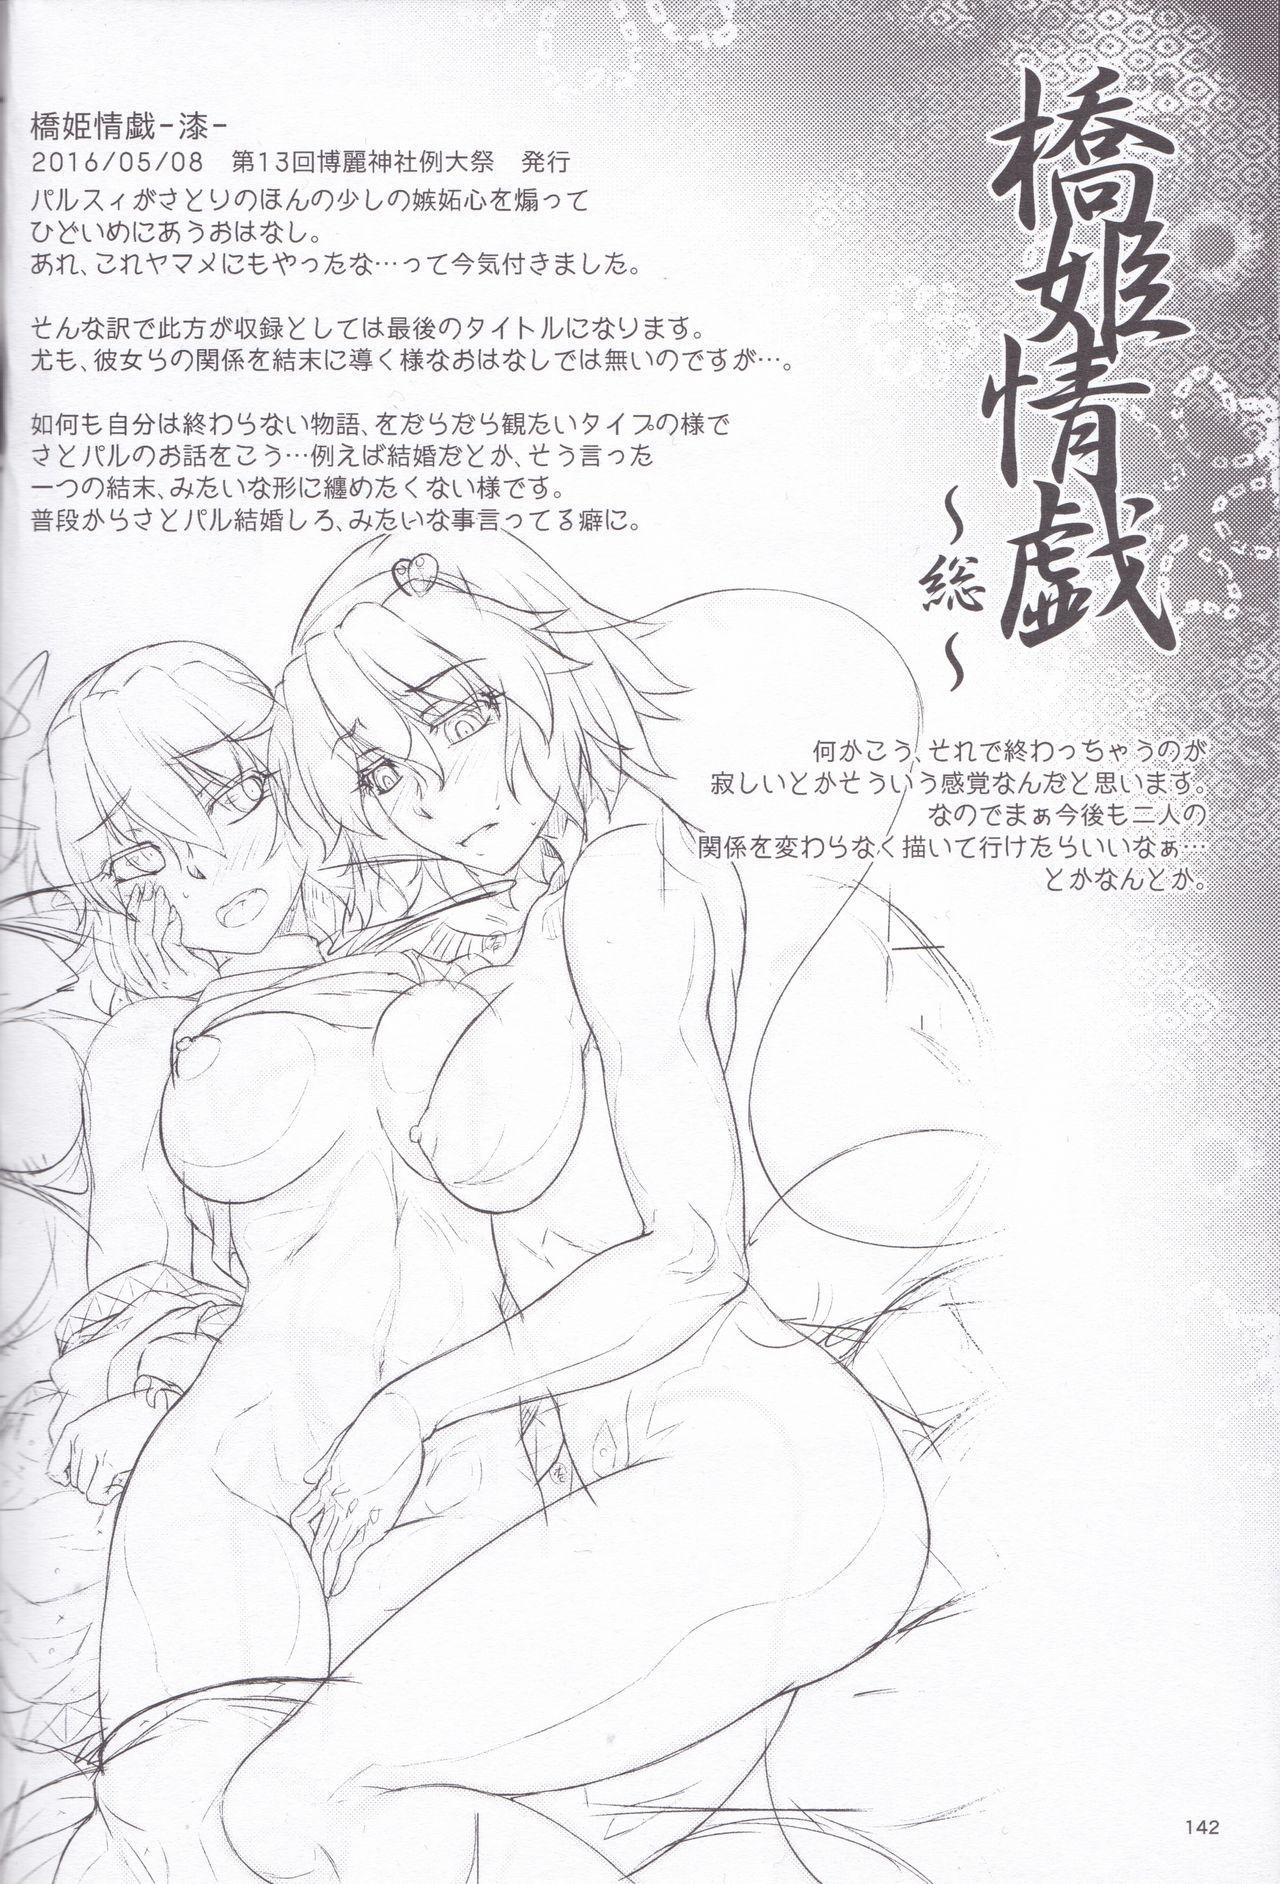 Hashihime Jougi 141